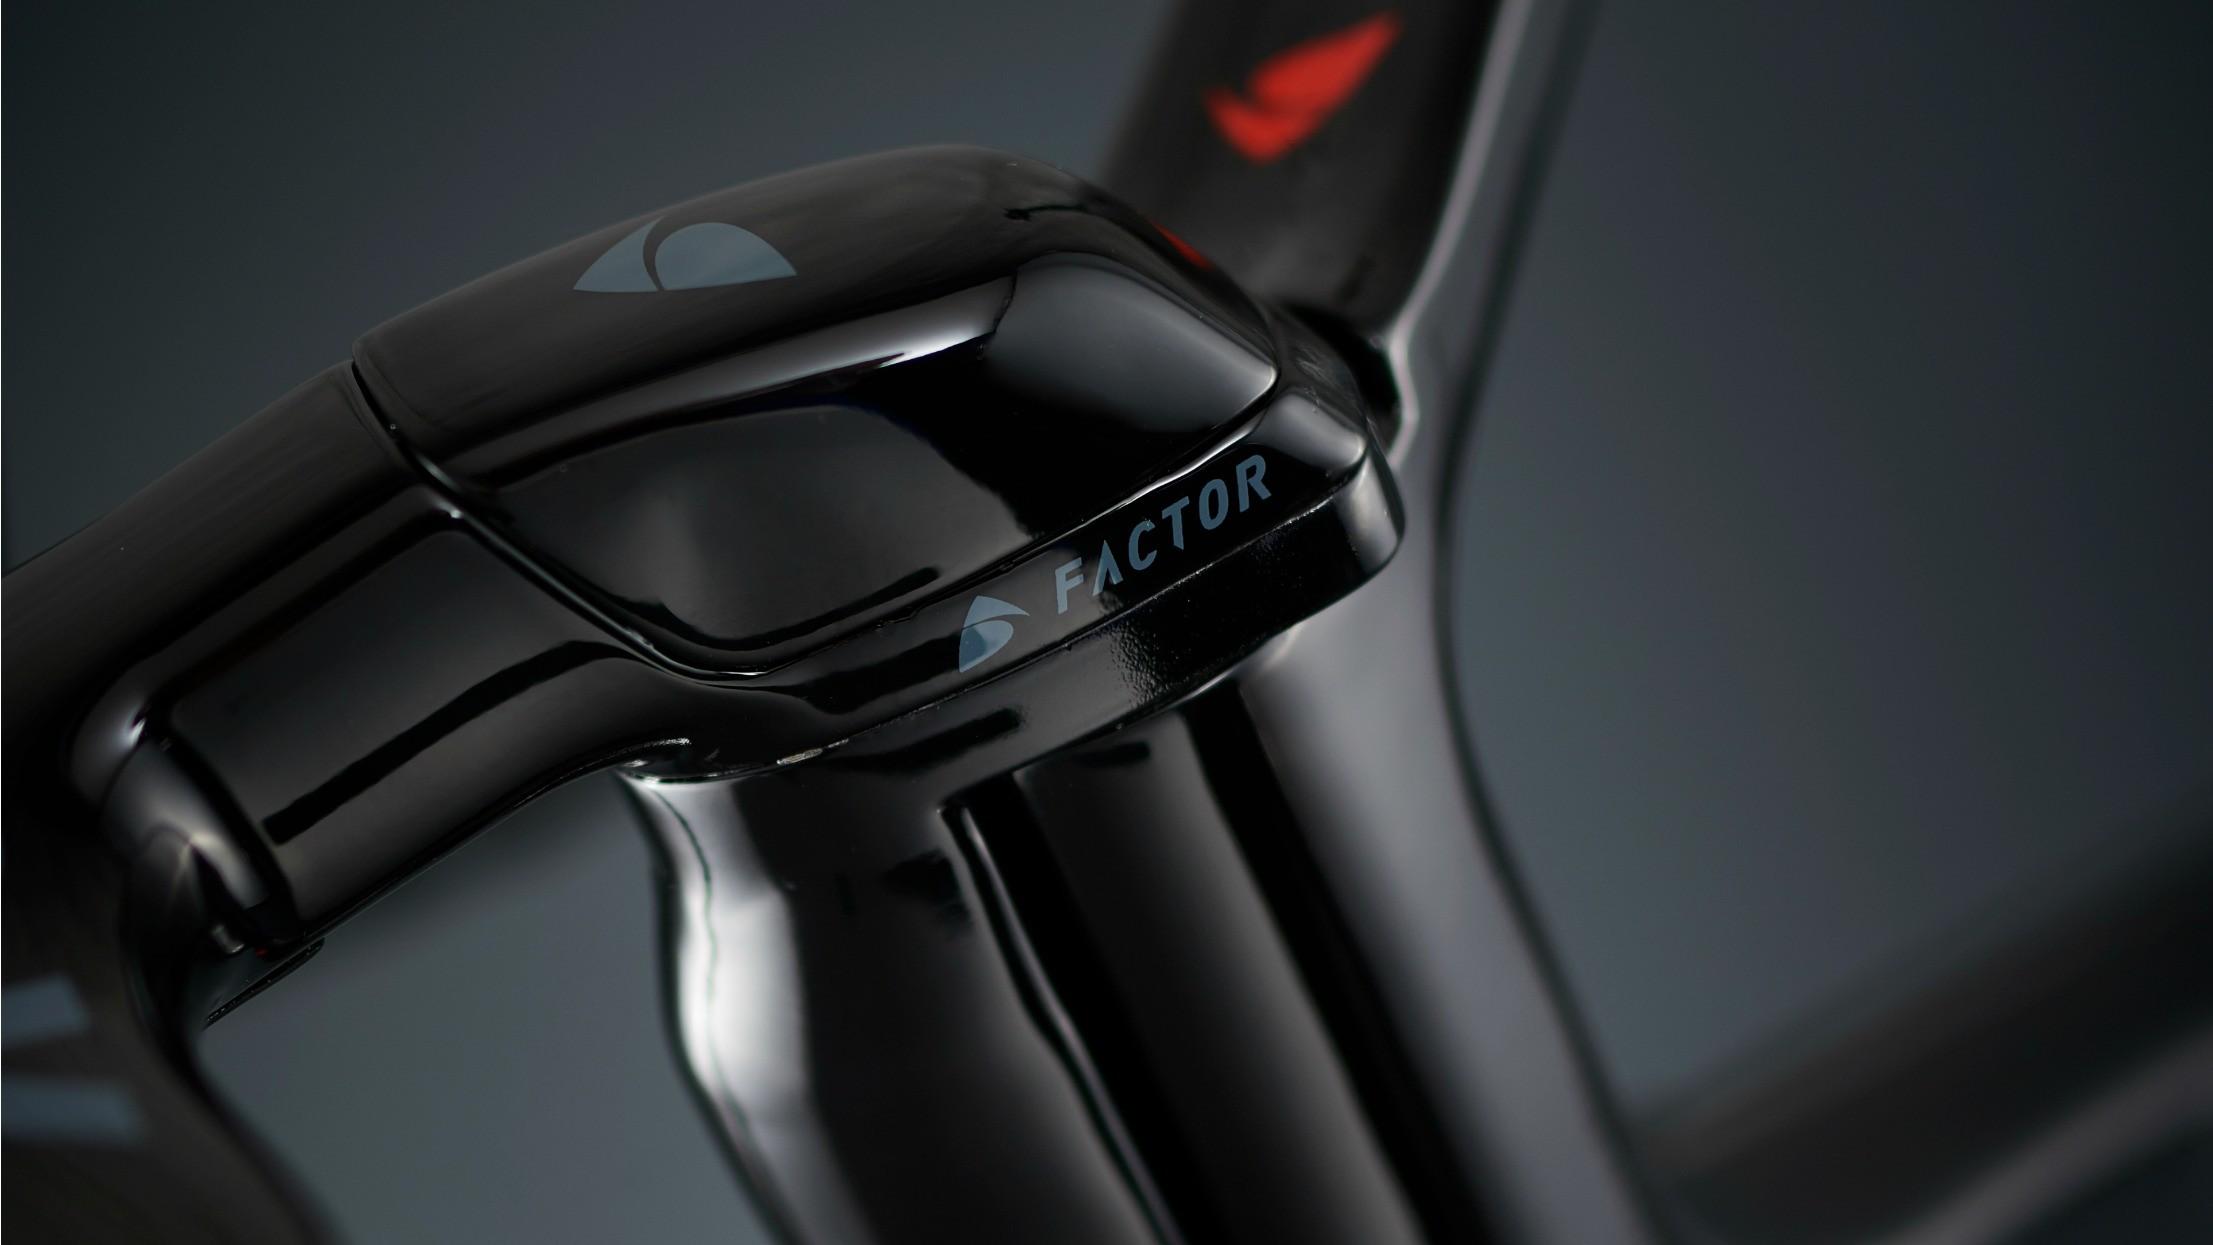 The integrated stem and handlebars promise plenty of stiffness